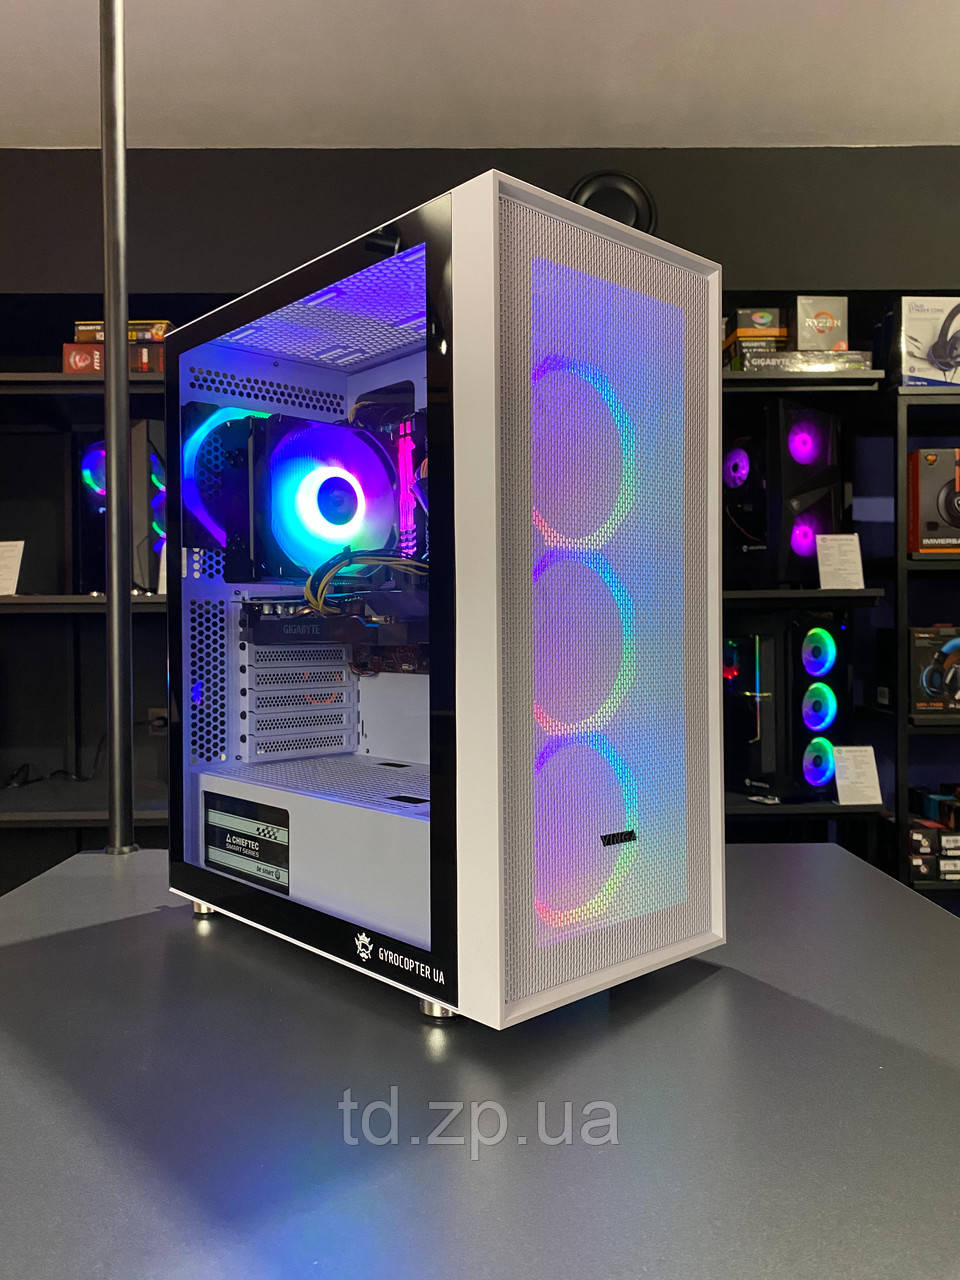 Ігровий комп'ютер Intel Core i3-10100f + RAM 16Gb+ HDD 1000Gb + SSD 120Gb + GTX 1070 8Gb